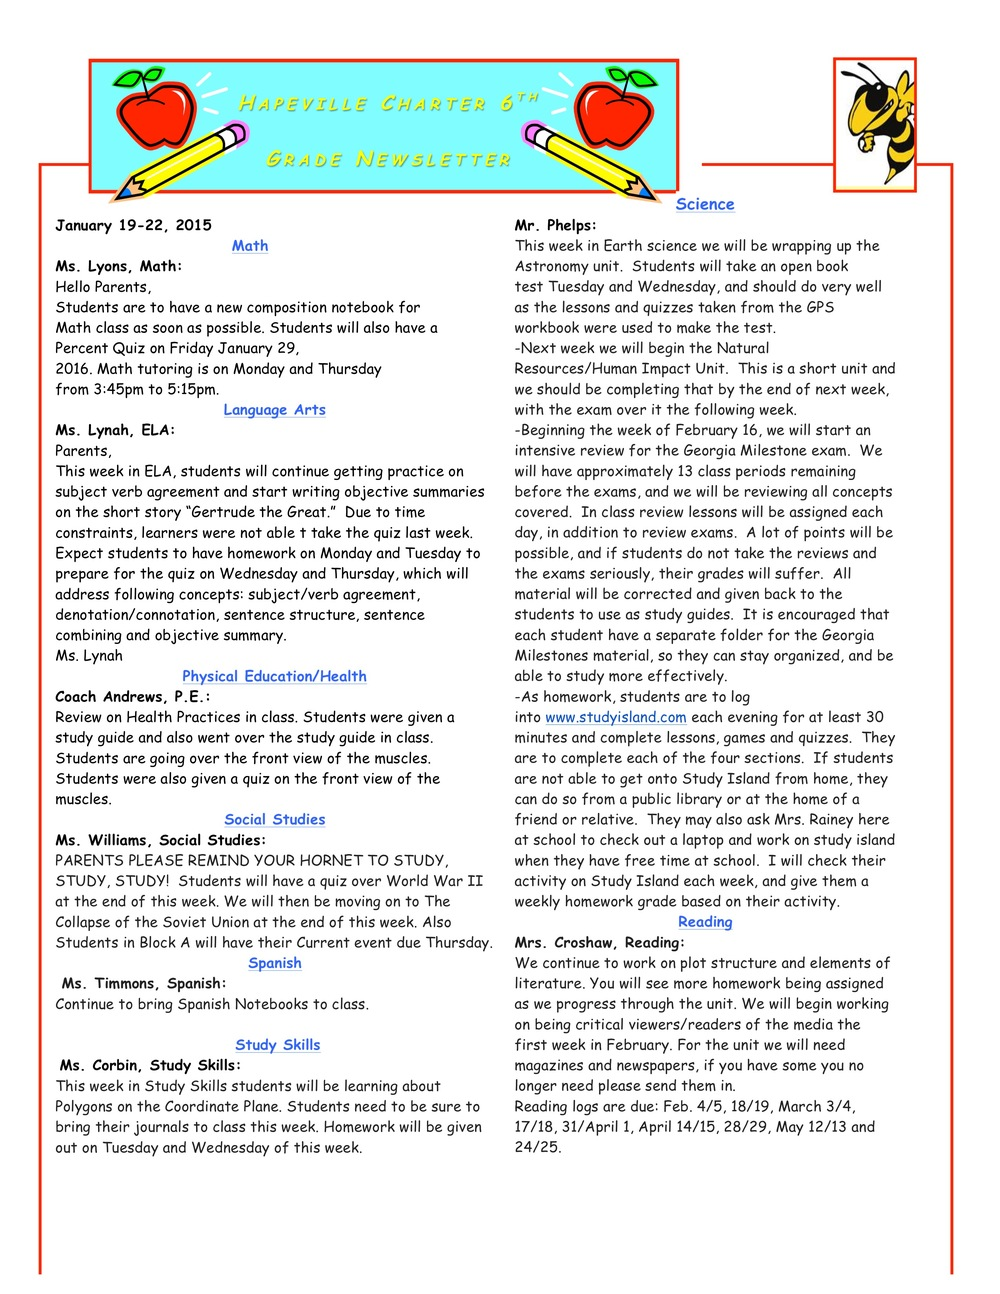 Newsletter Image6th grade 1 25.jpeg